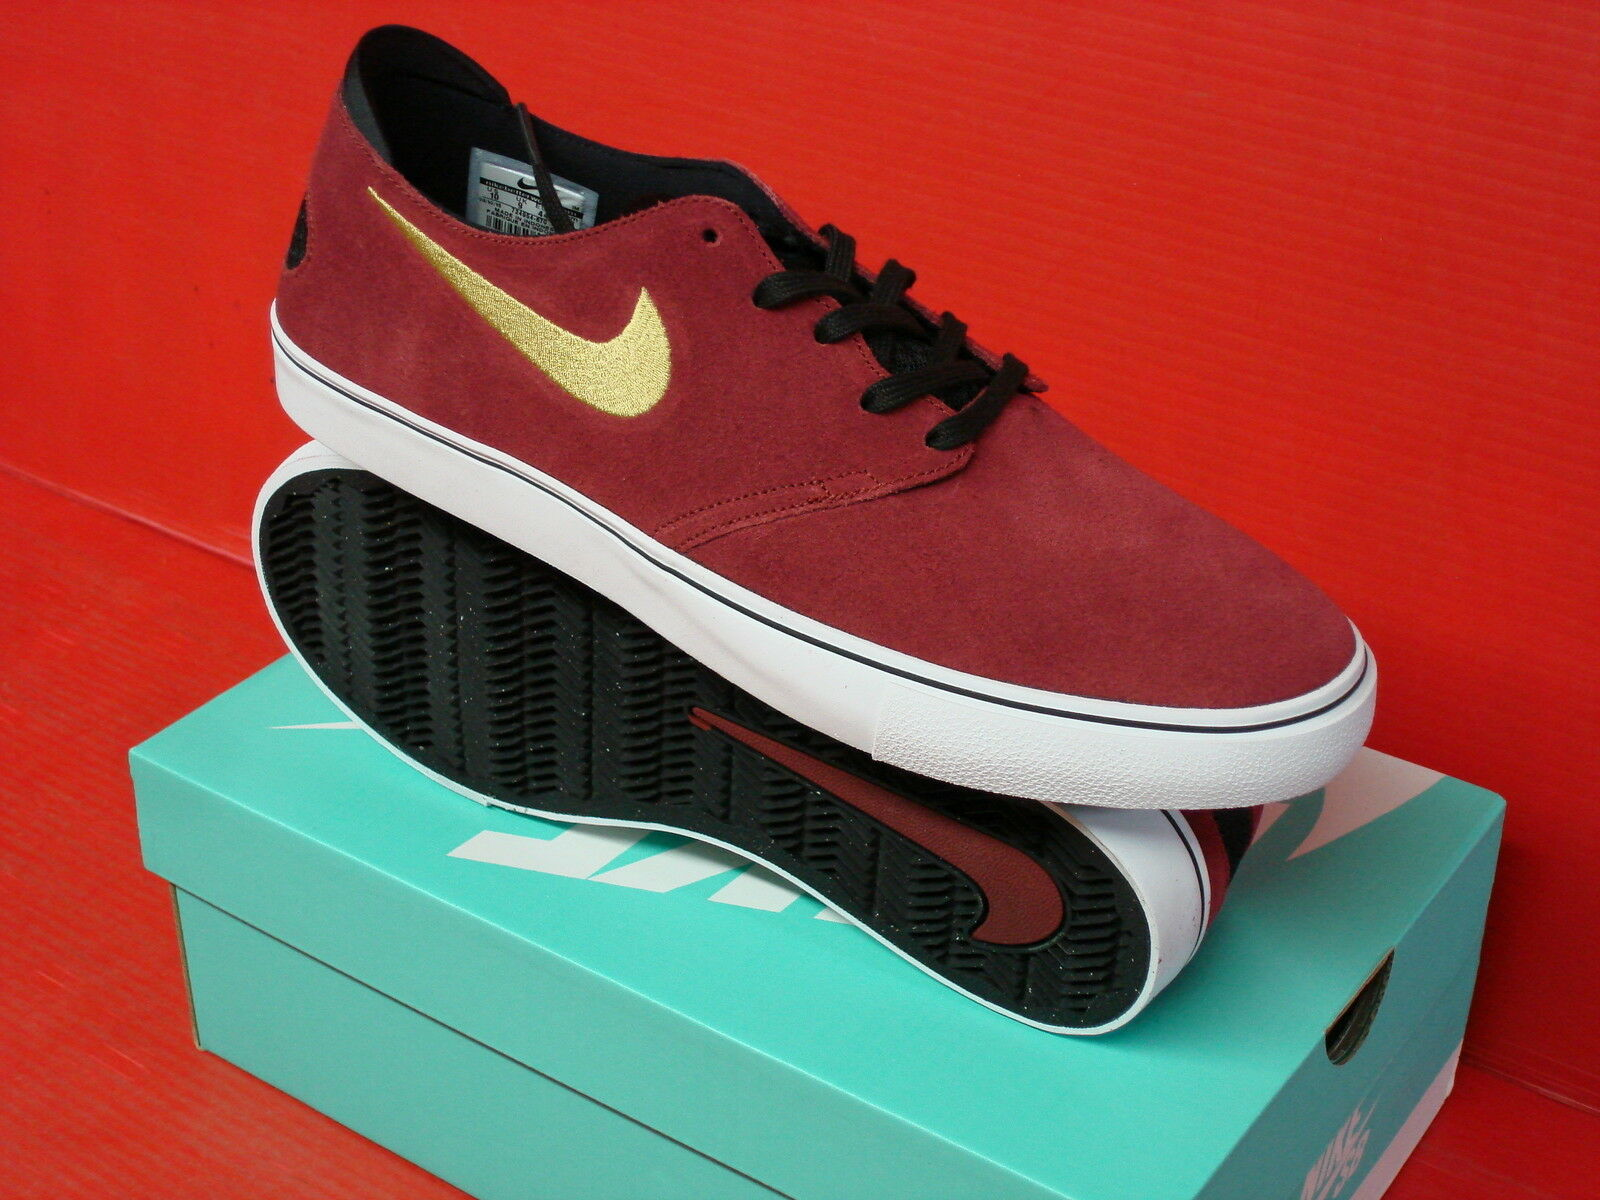 Nike Zoom SB Hombre skate Oneshot 724954 Oneshot skate 898b74